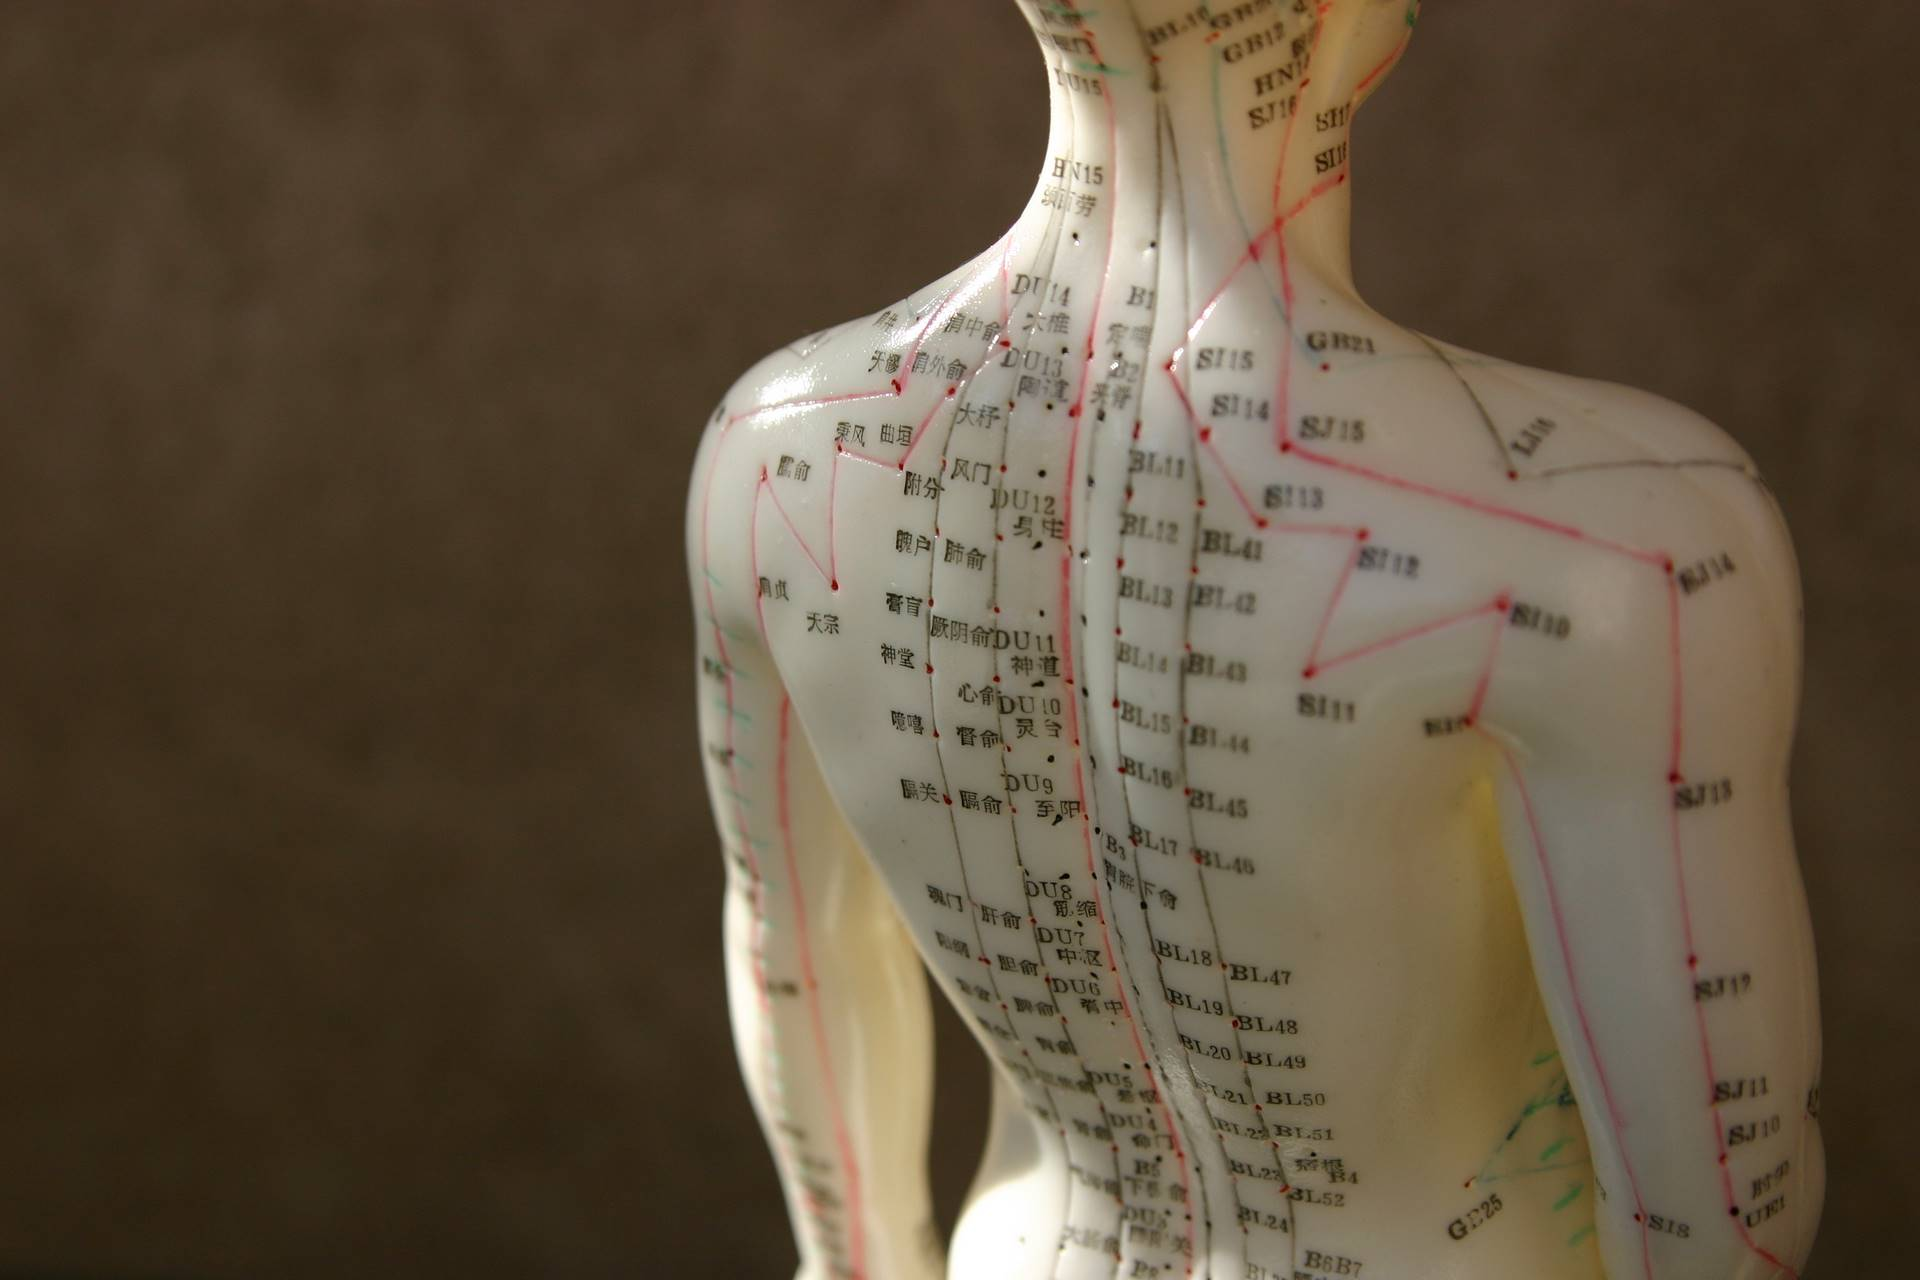 qi_yin_yang_five-elements_the-meridians-internal-organs-causes-diseas-traditional-chinese-medicine-stockholm-6.jpg